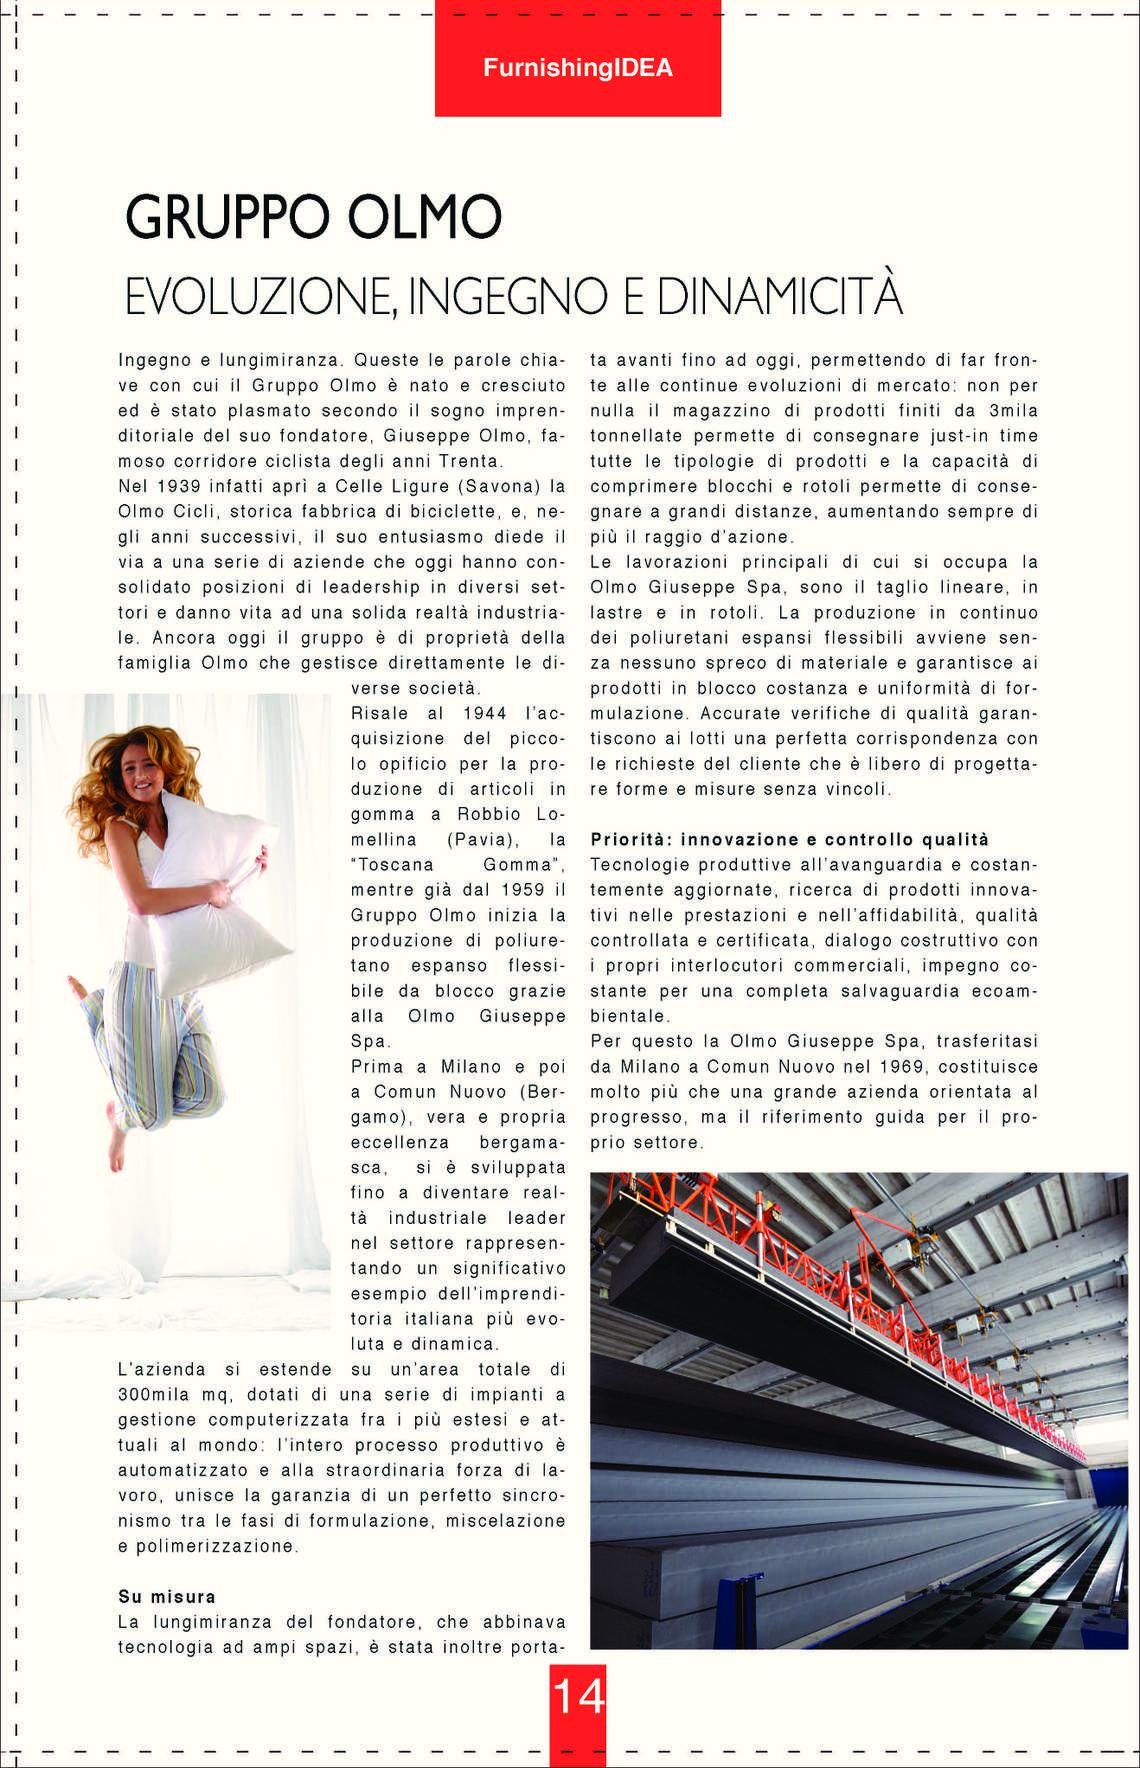 furnishing-idea-journal--1-2018_journal_9_013.jpg